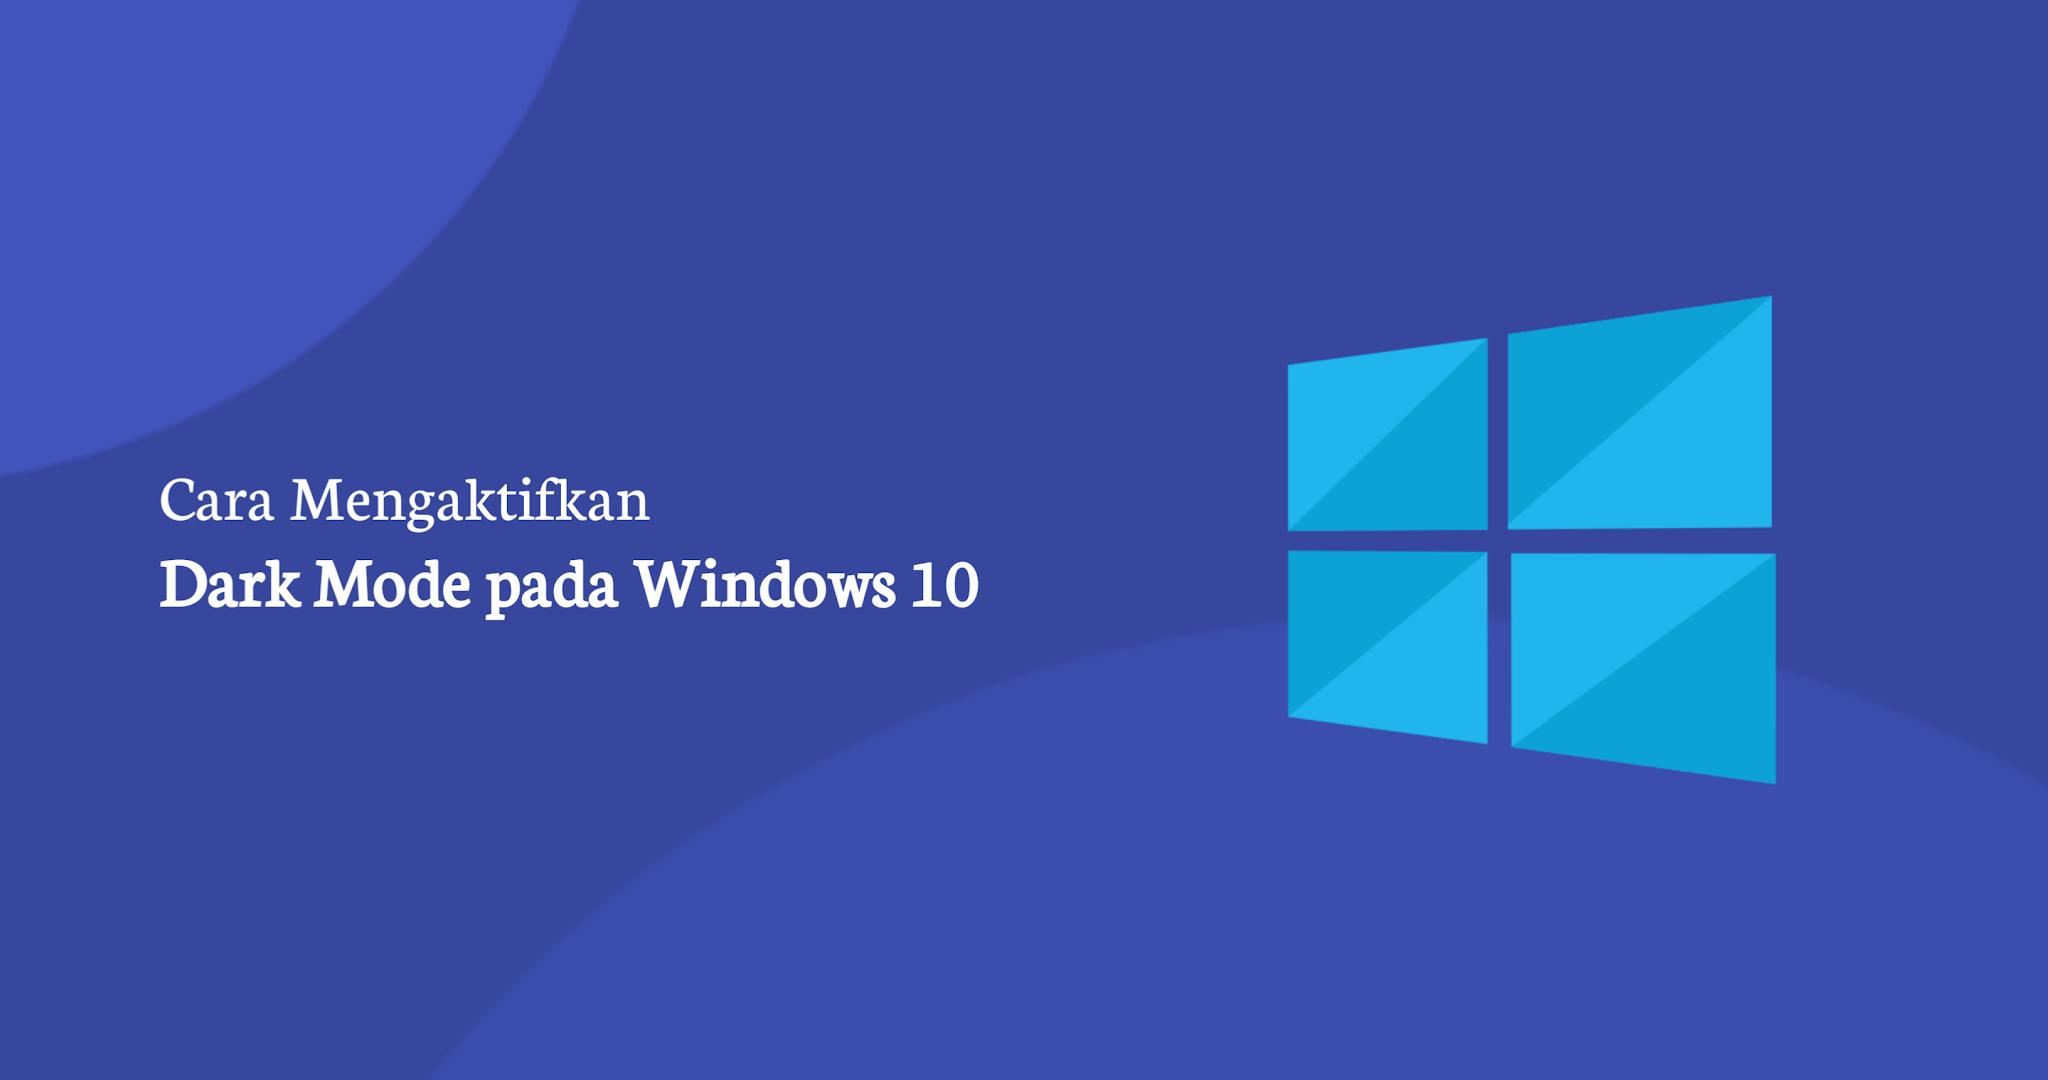 Cara Mengaktifkan Dark Mode pada Windows 10